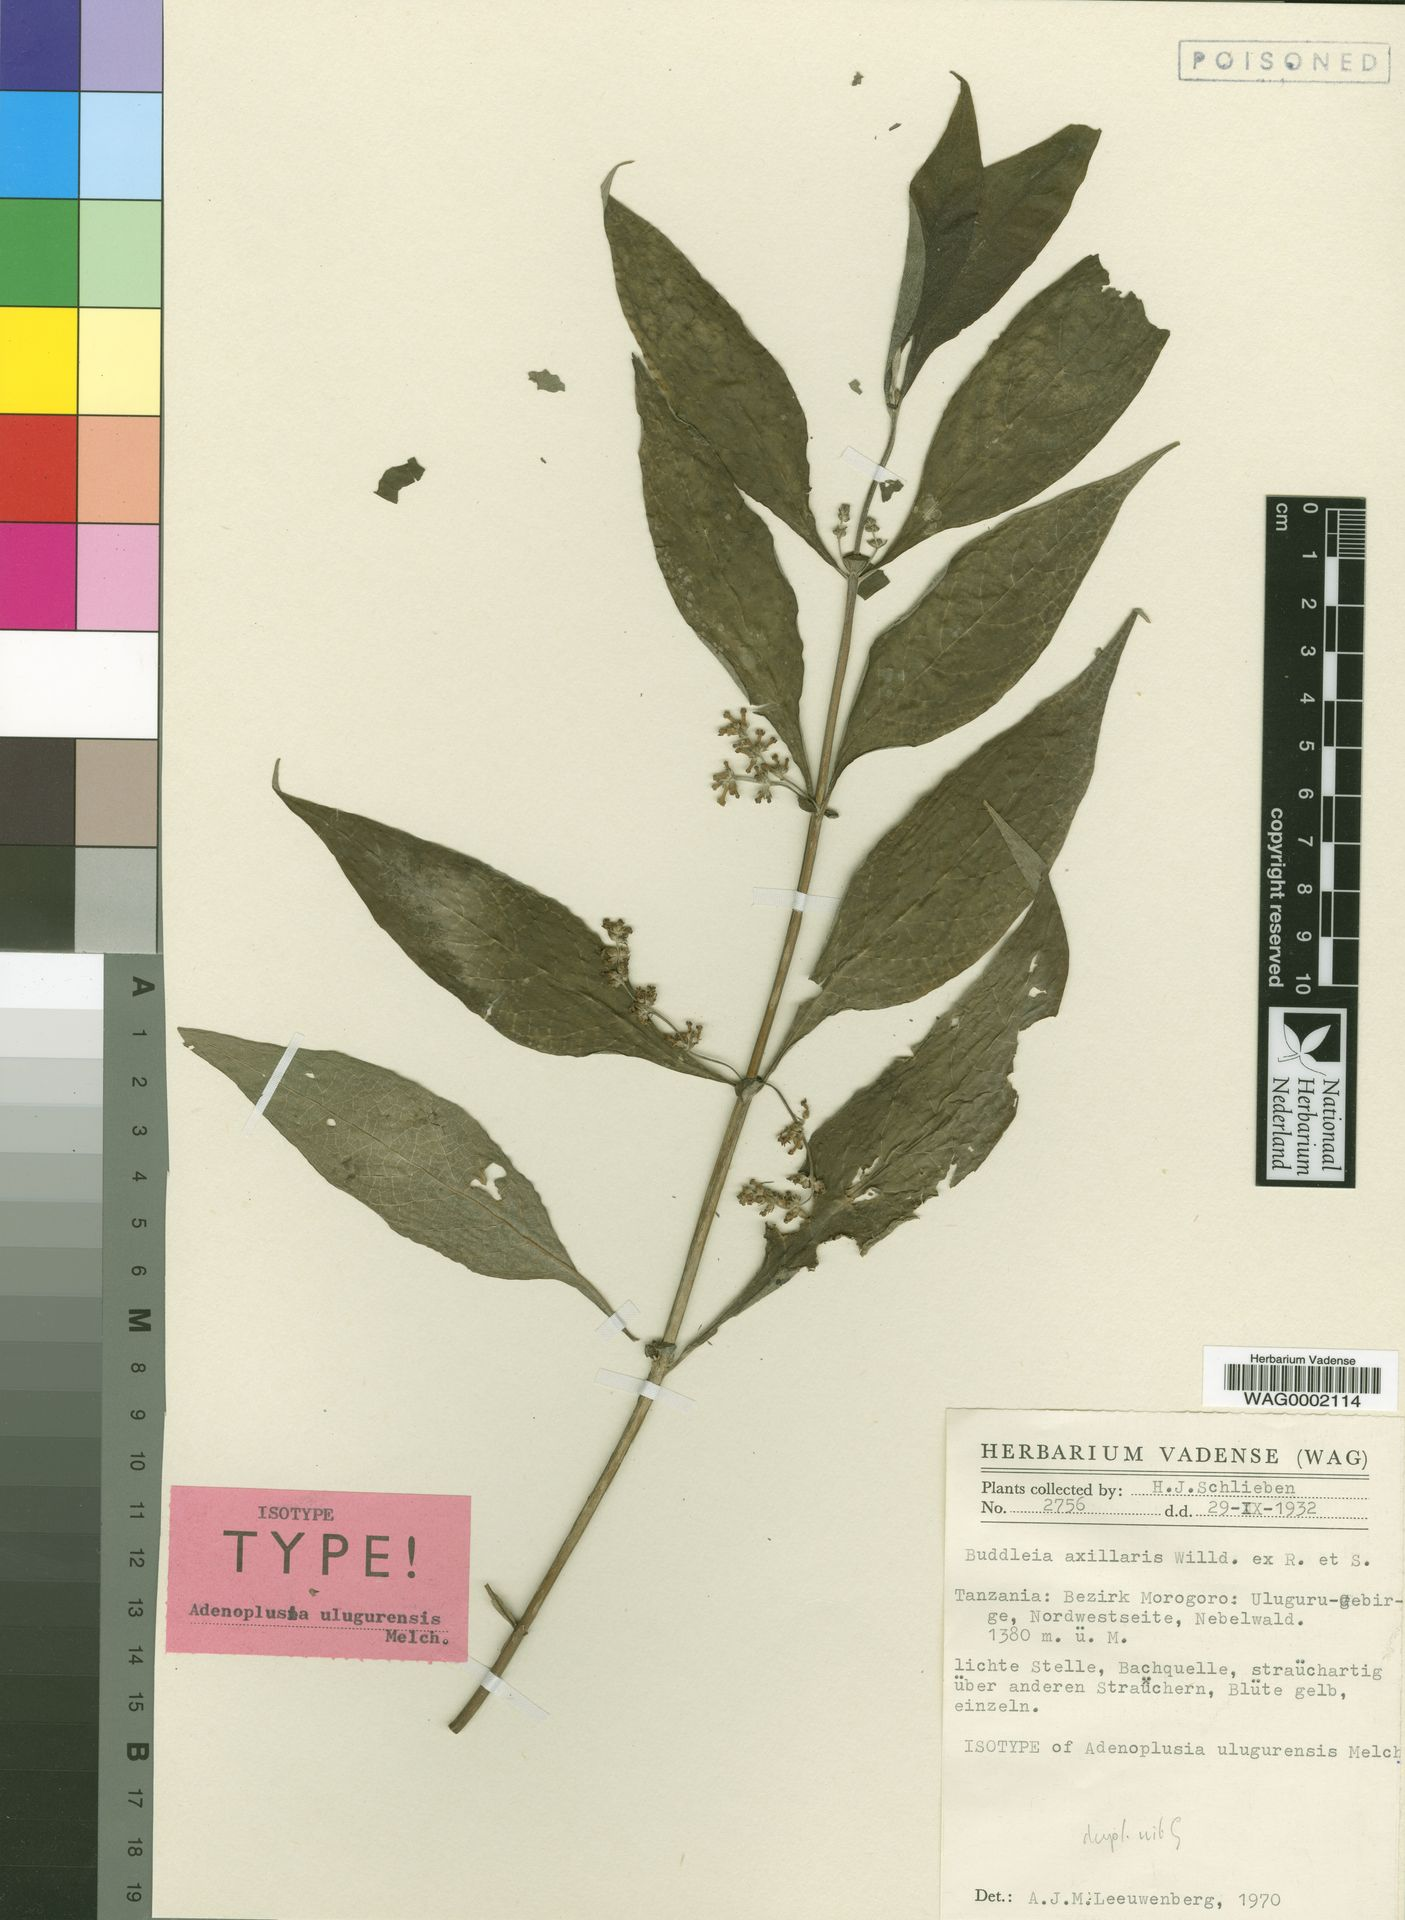 WAG0002114 | Buddleja axillaris Willd. ex Roem. & Schult.